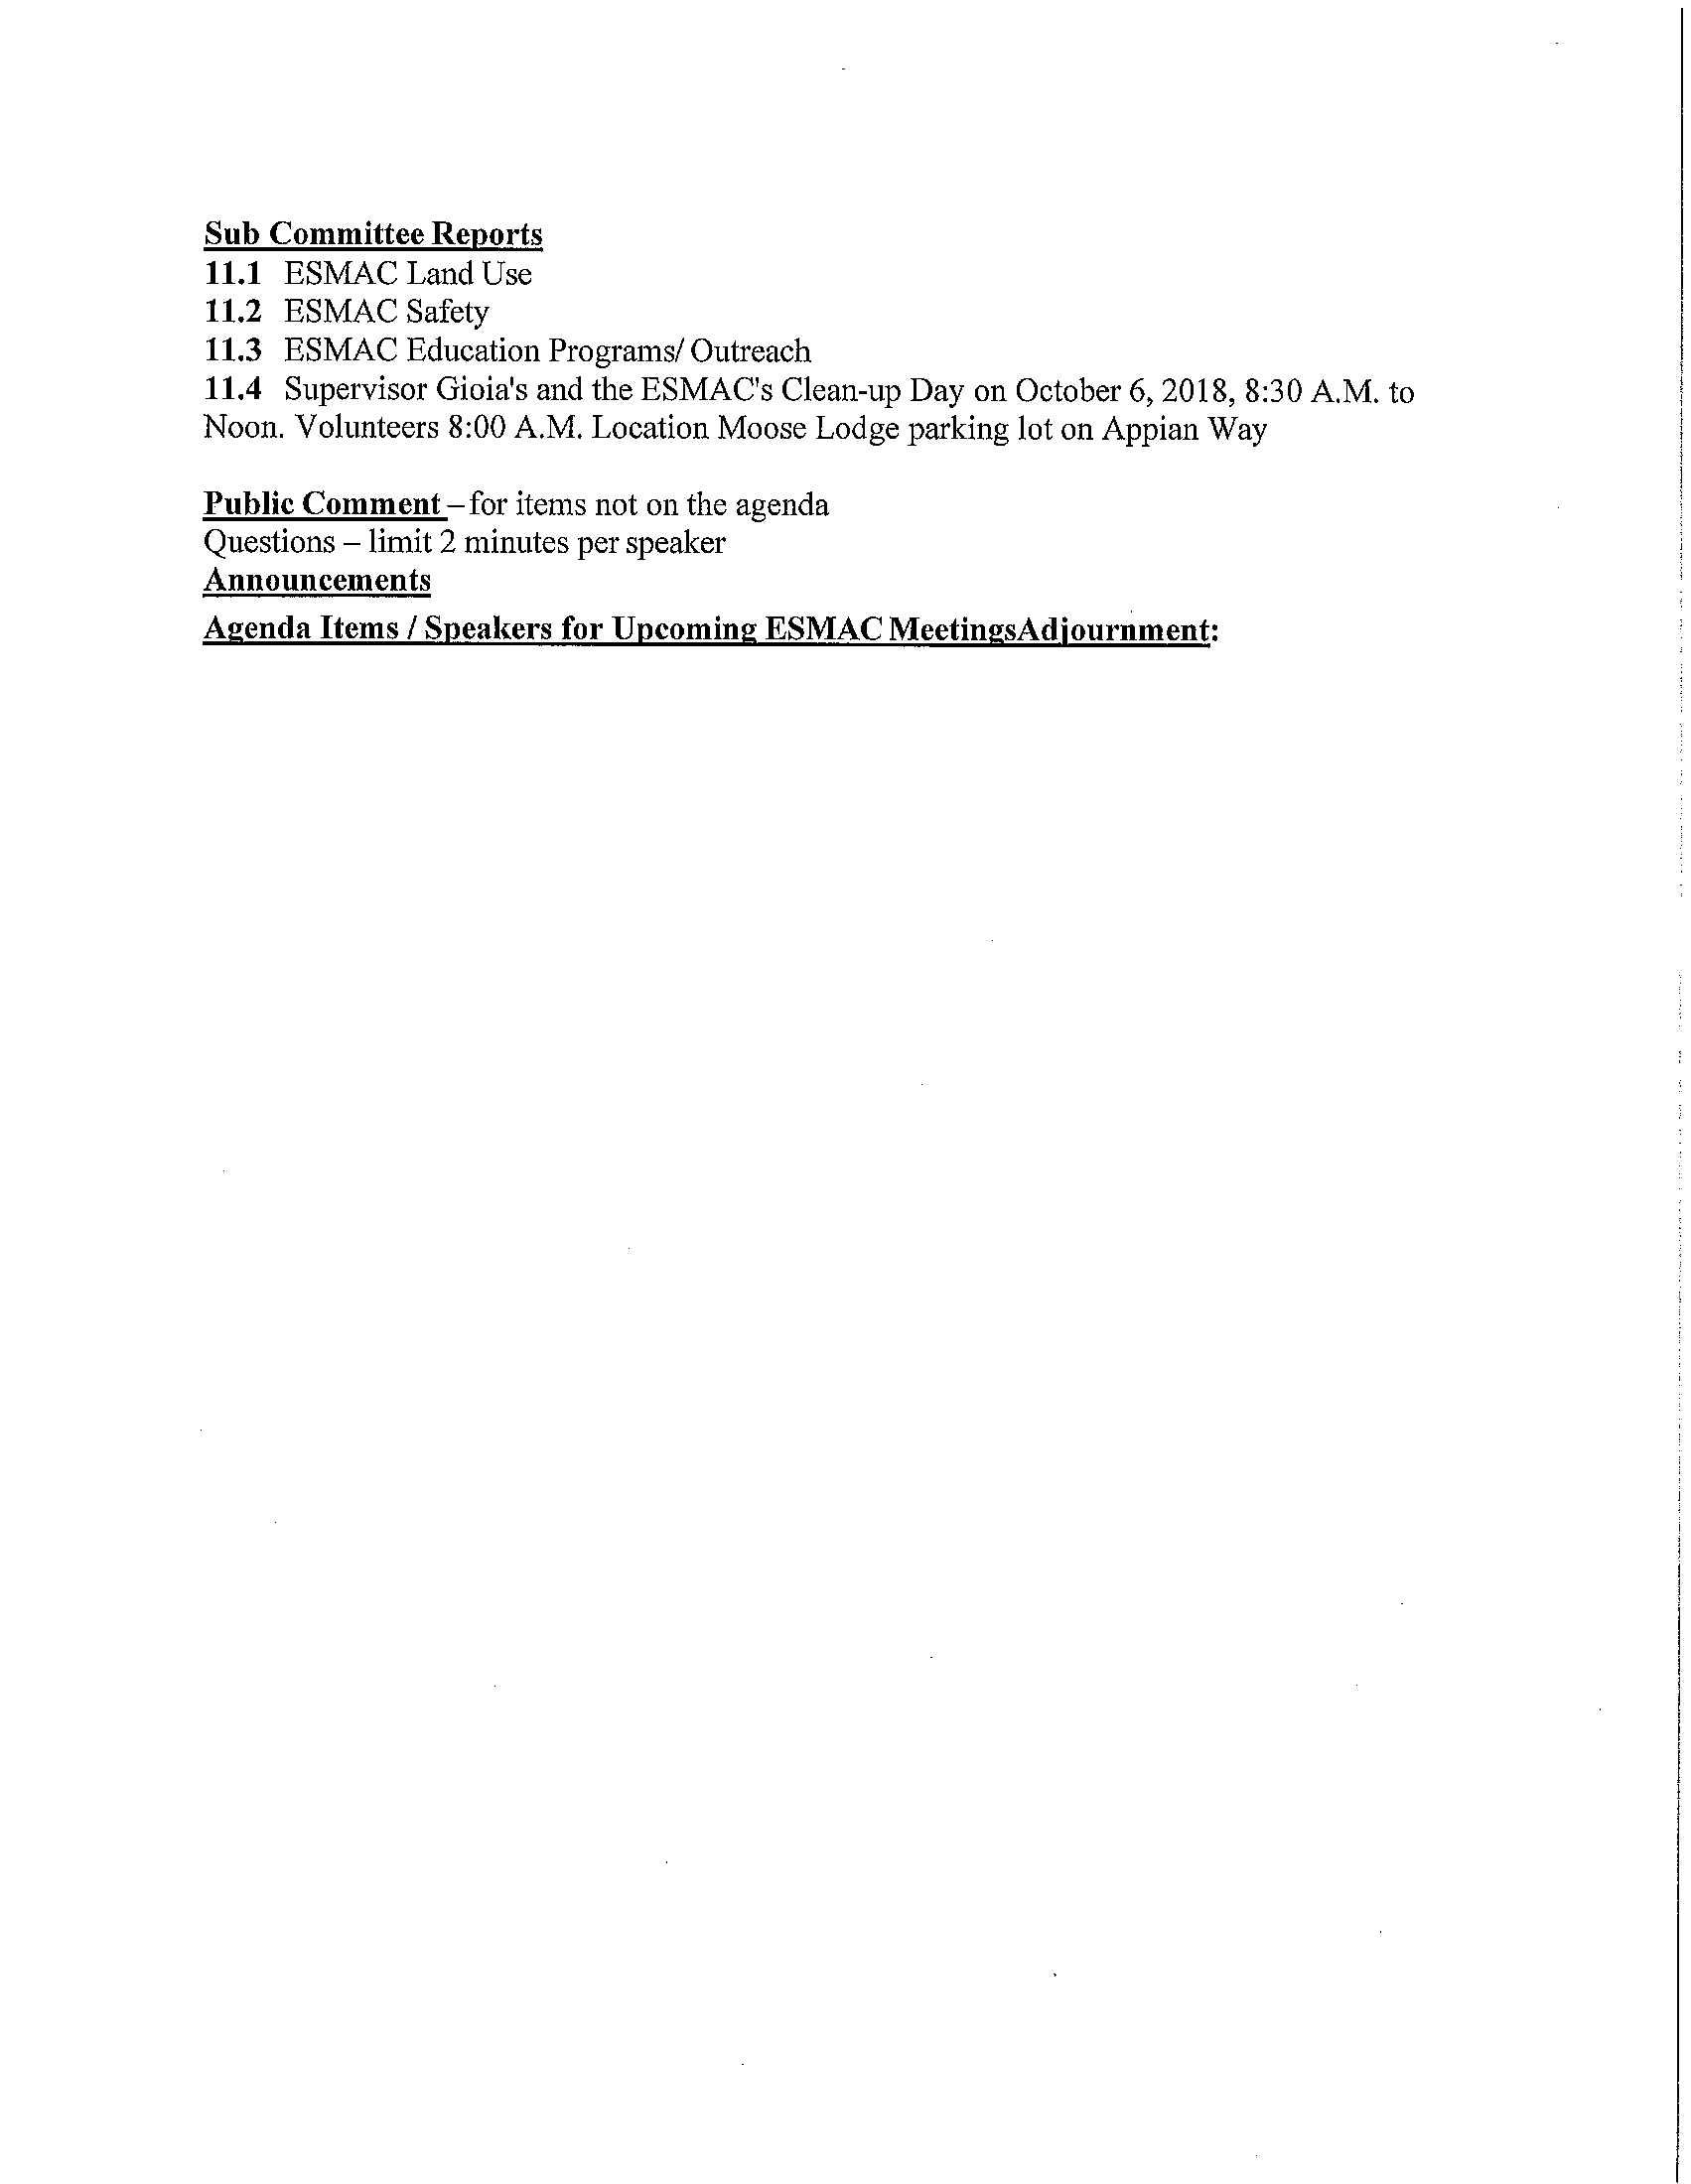 ESMAC Agenda 10.10.2018 (32 Pages)_3.jpg